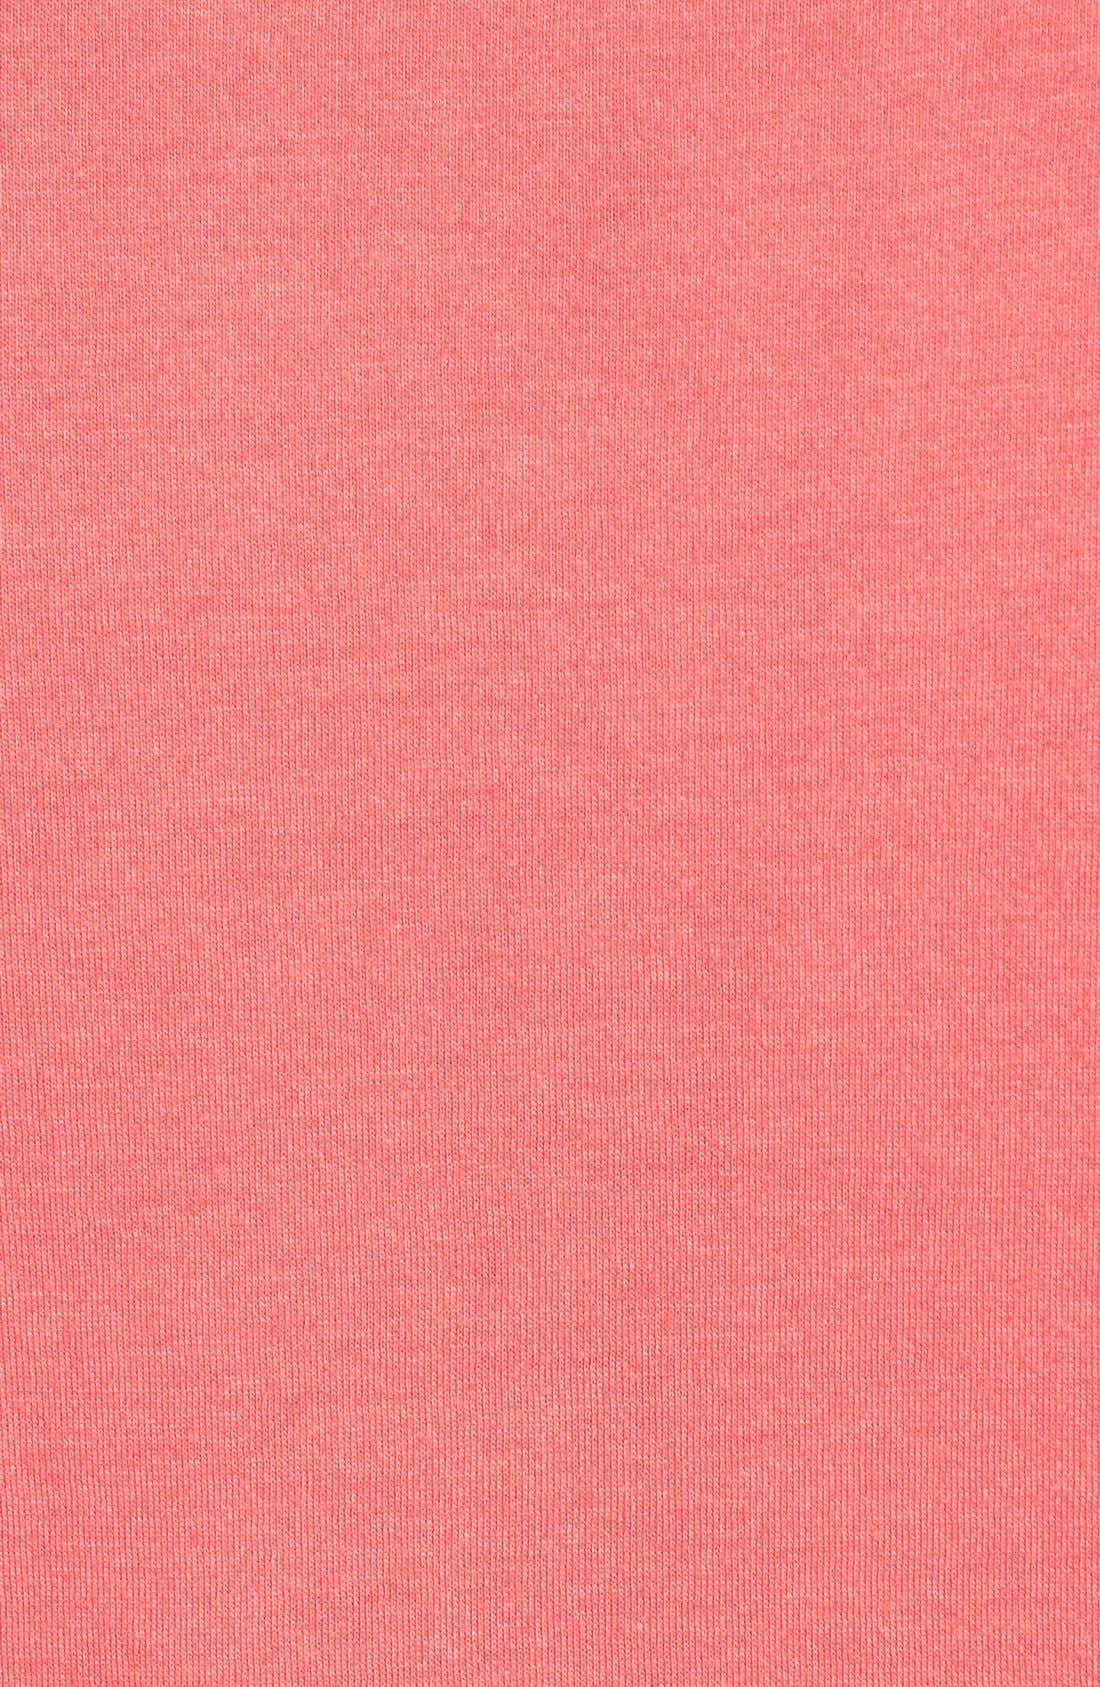 Short Sleeve Crewneck Tee,                             Alternate thumbnail 100, color,